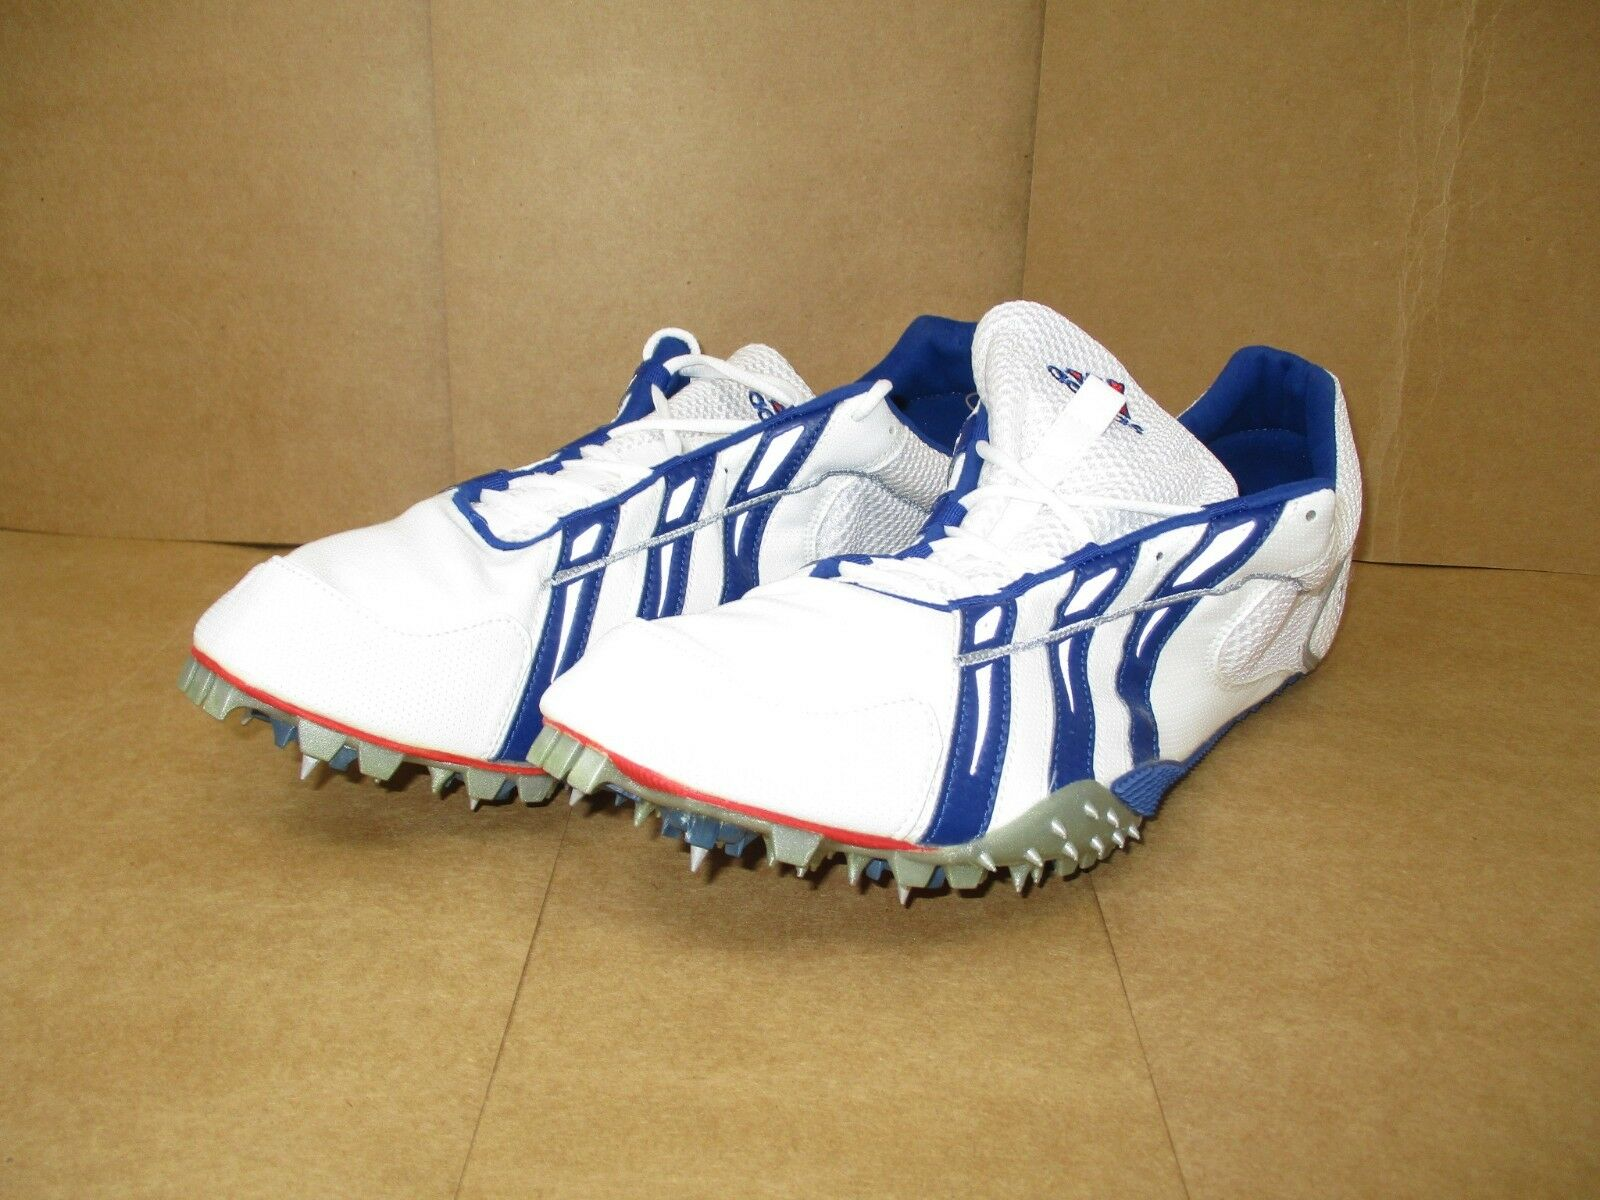 Adidas lightsp track & field ha adistar lightsp Adidas galloccia uomo numero 14 280d1a